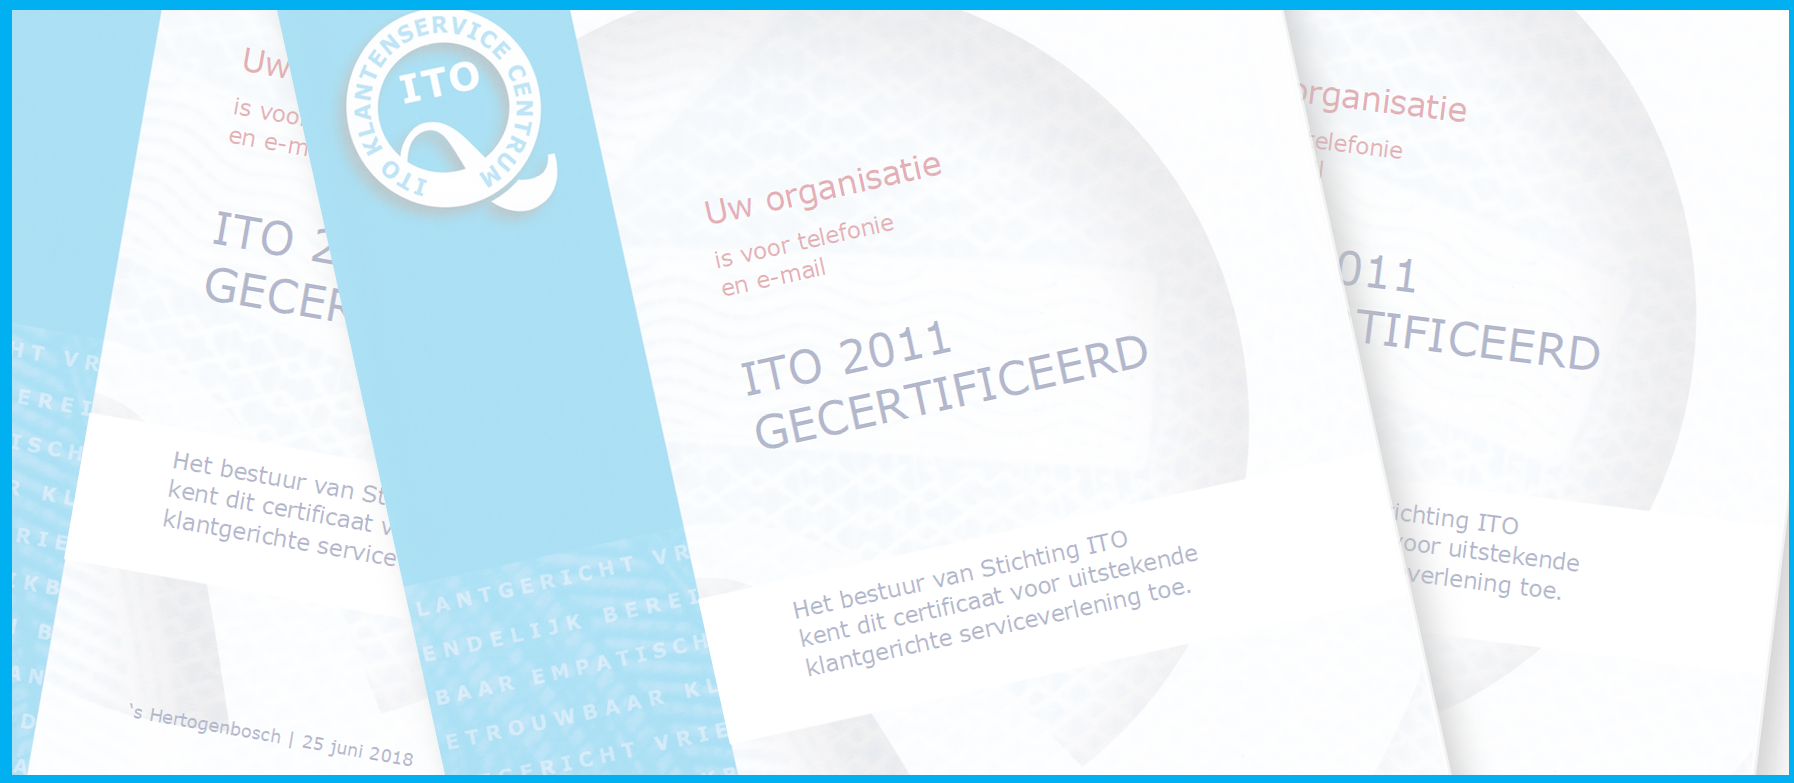 Stichting ITO